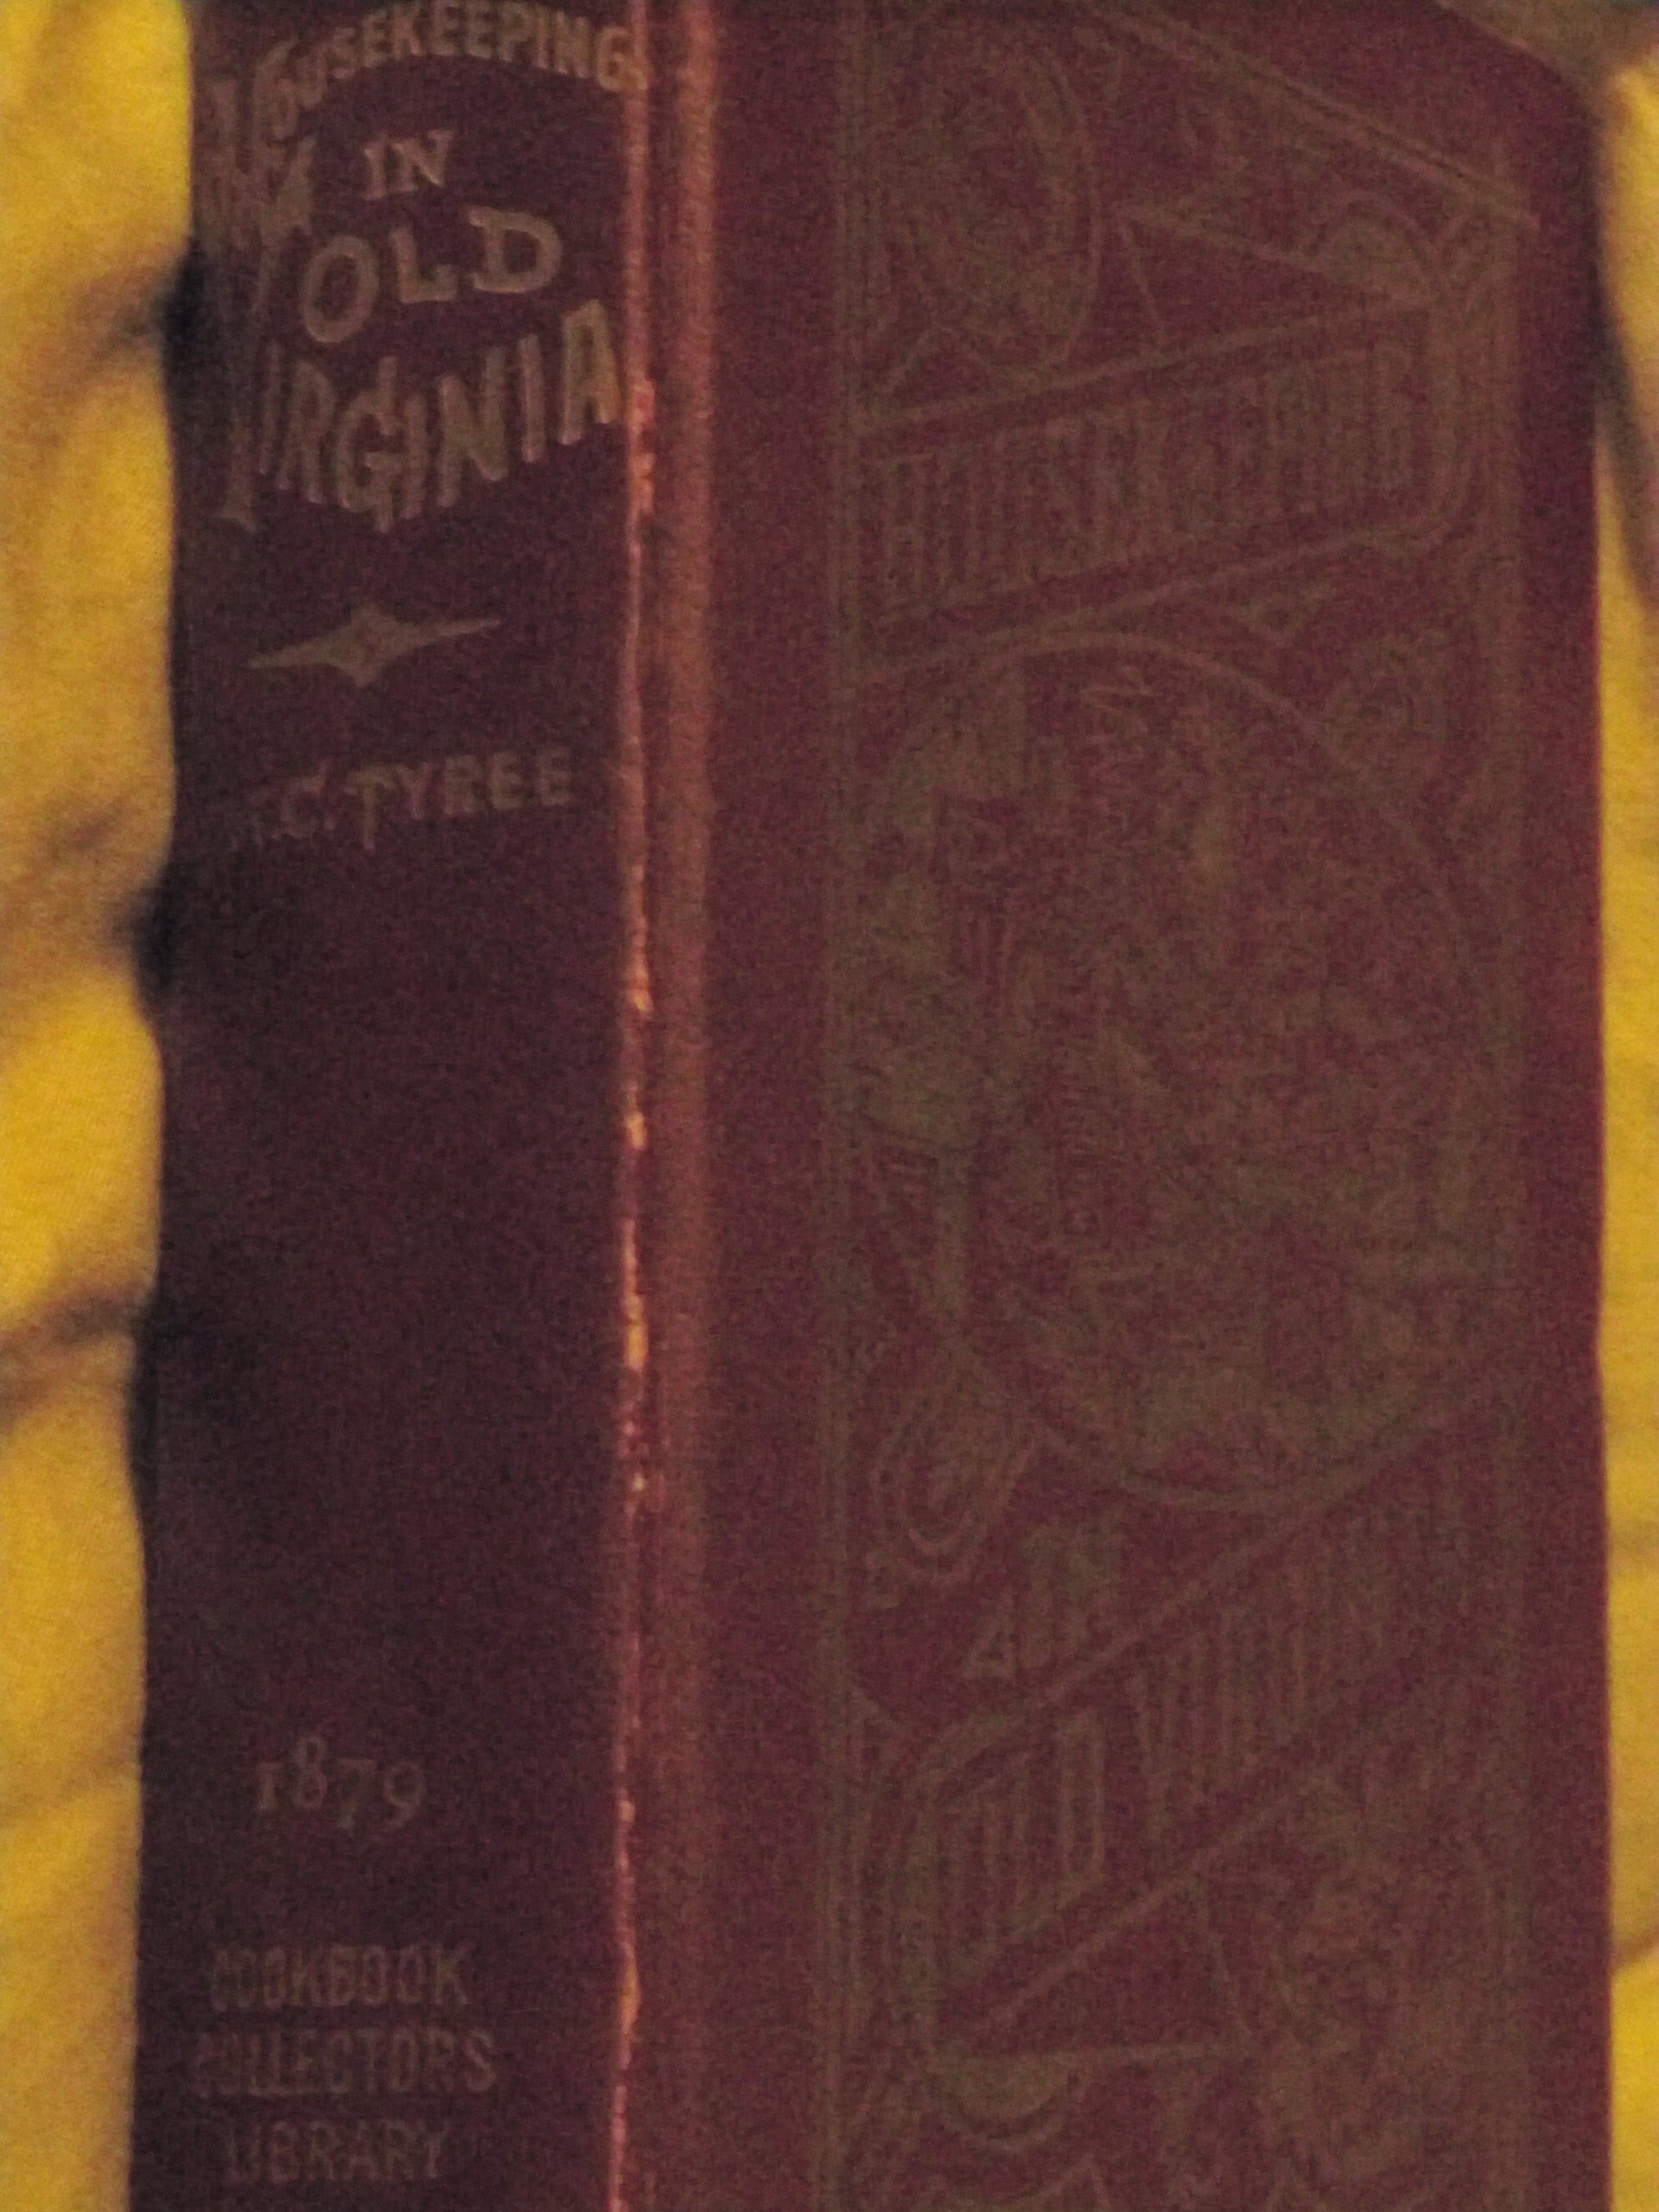 Download Housekeeping In Old Virginia (Housekeeping In Keeping In Old Virginia, Cookbook Collectors Library) pdf epub